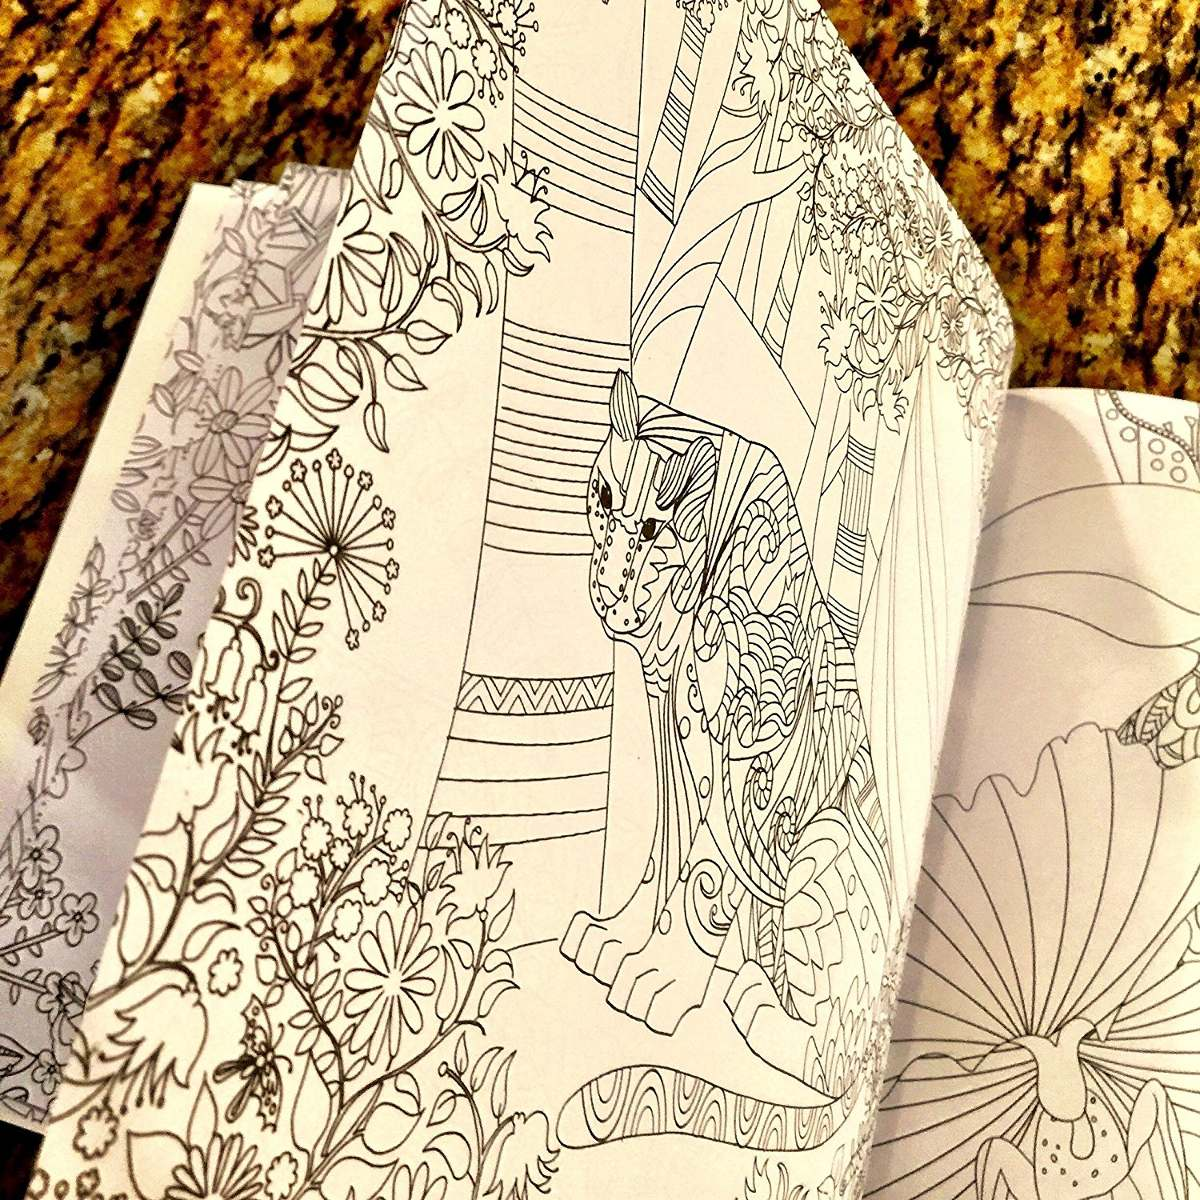 Excepcional Titánico Libro Para Colorear Ideas - Enmarcado Para ...